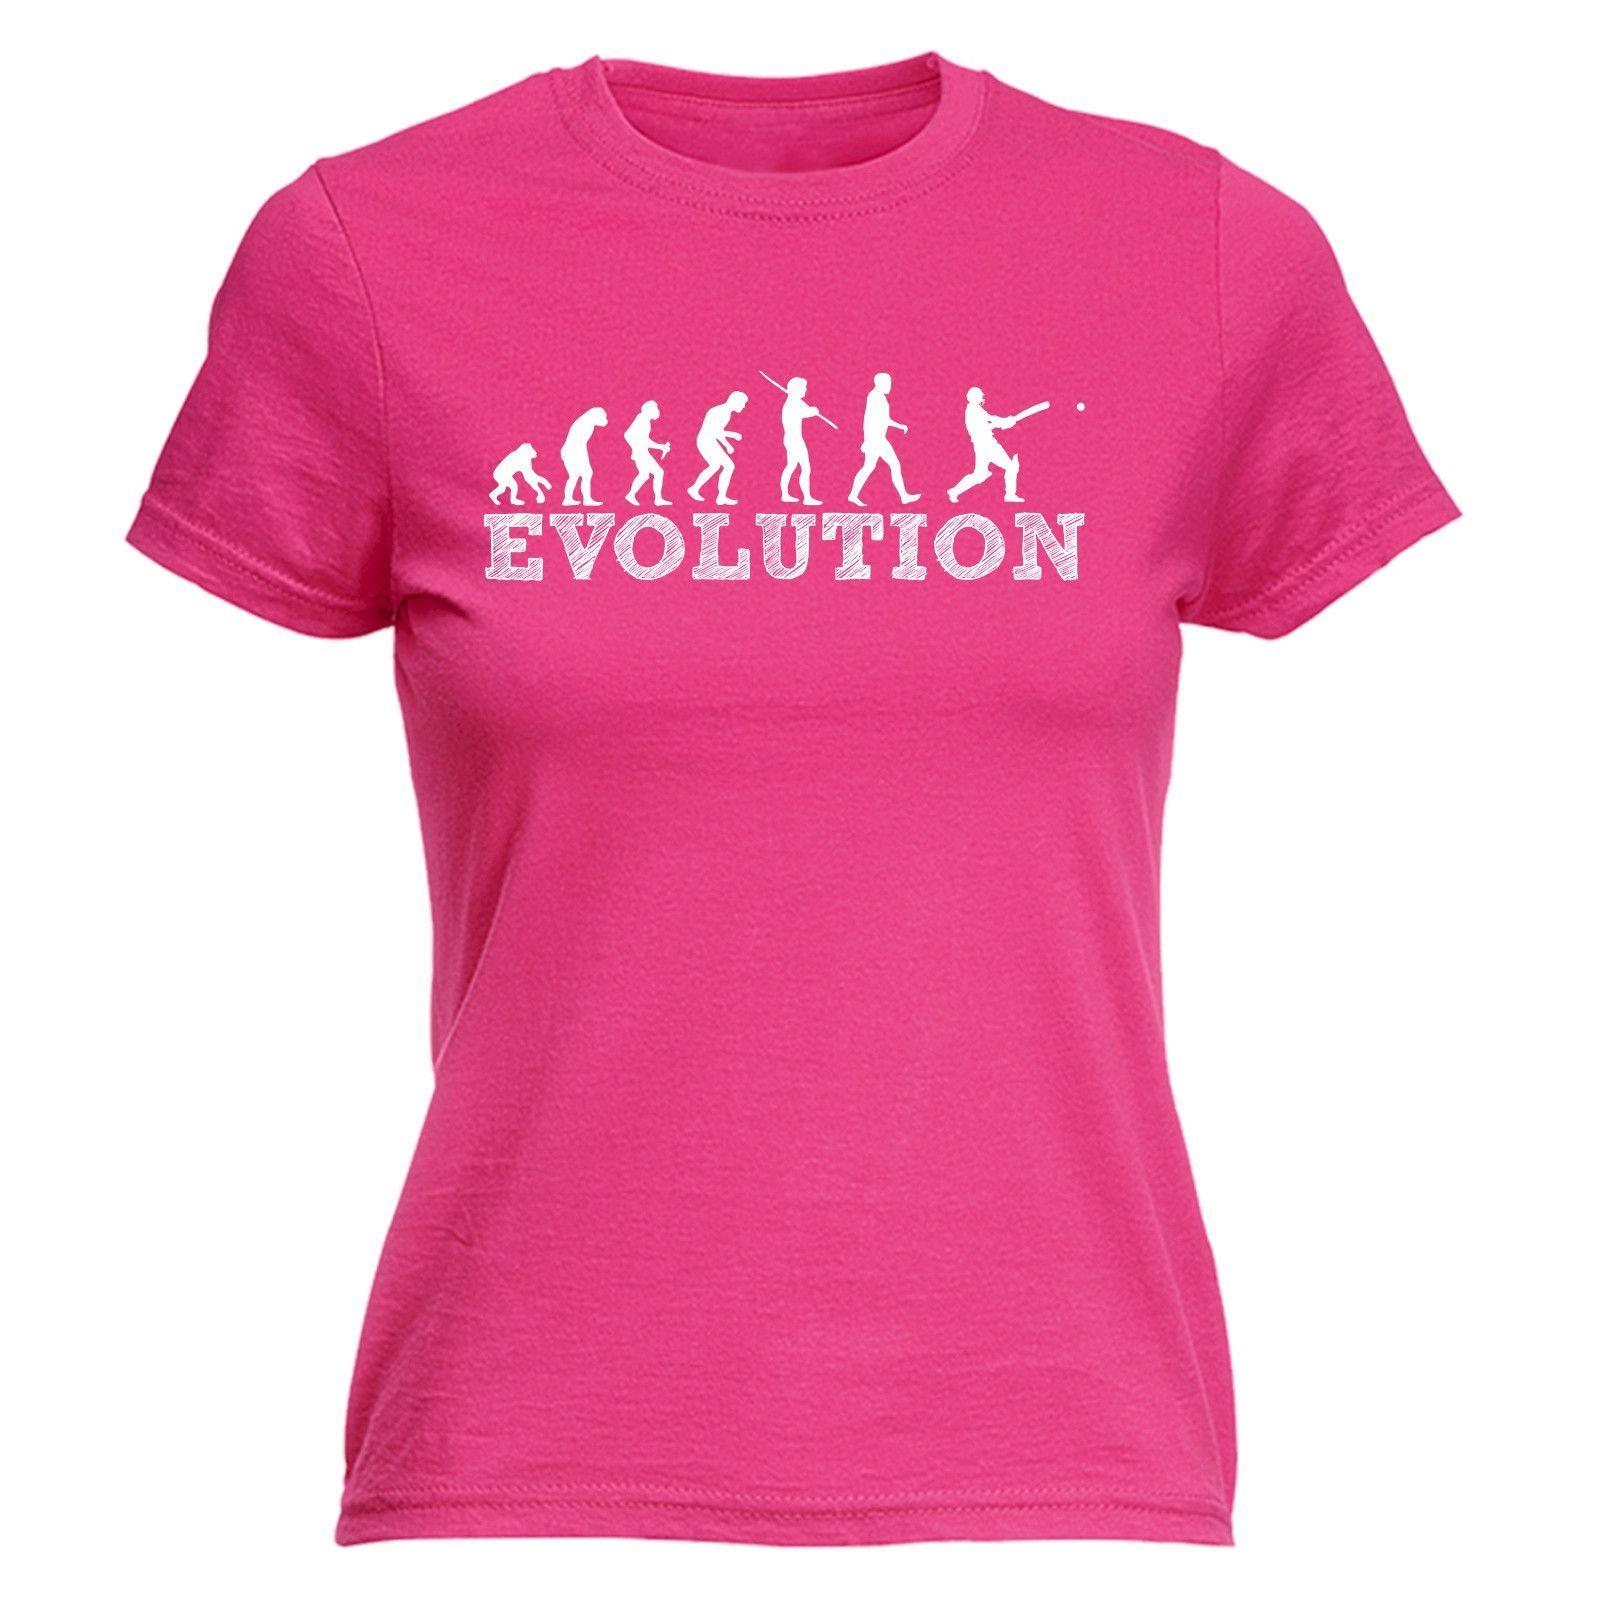 123t USA Women's Evolution Cricket Funny T-Shirt